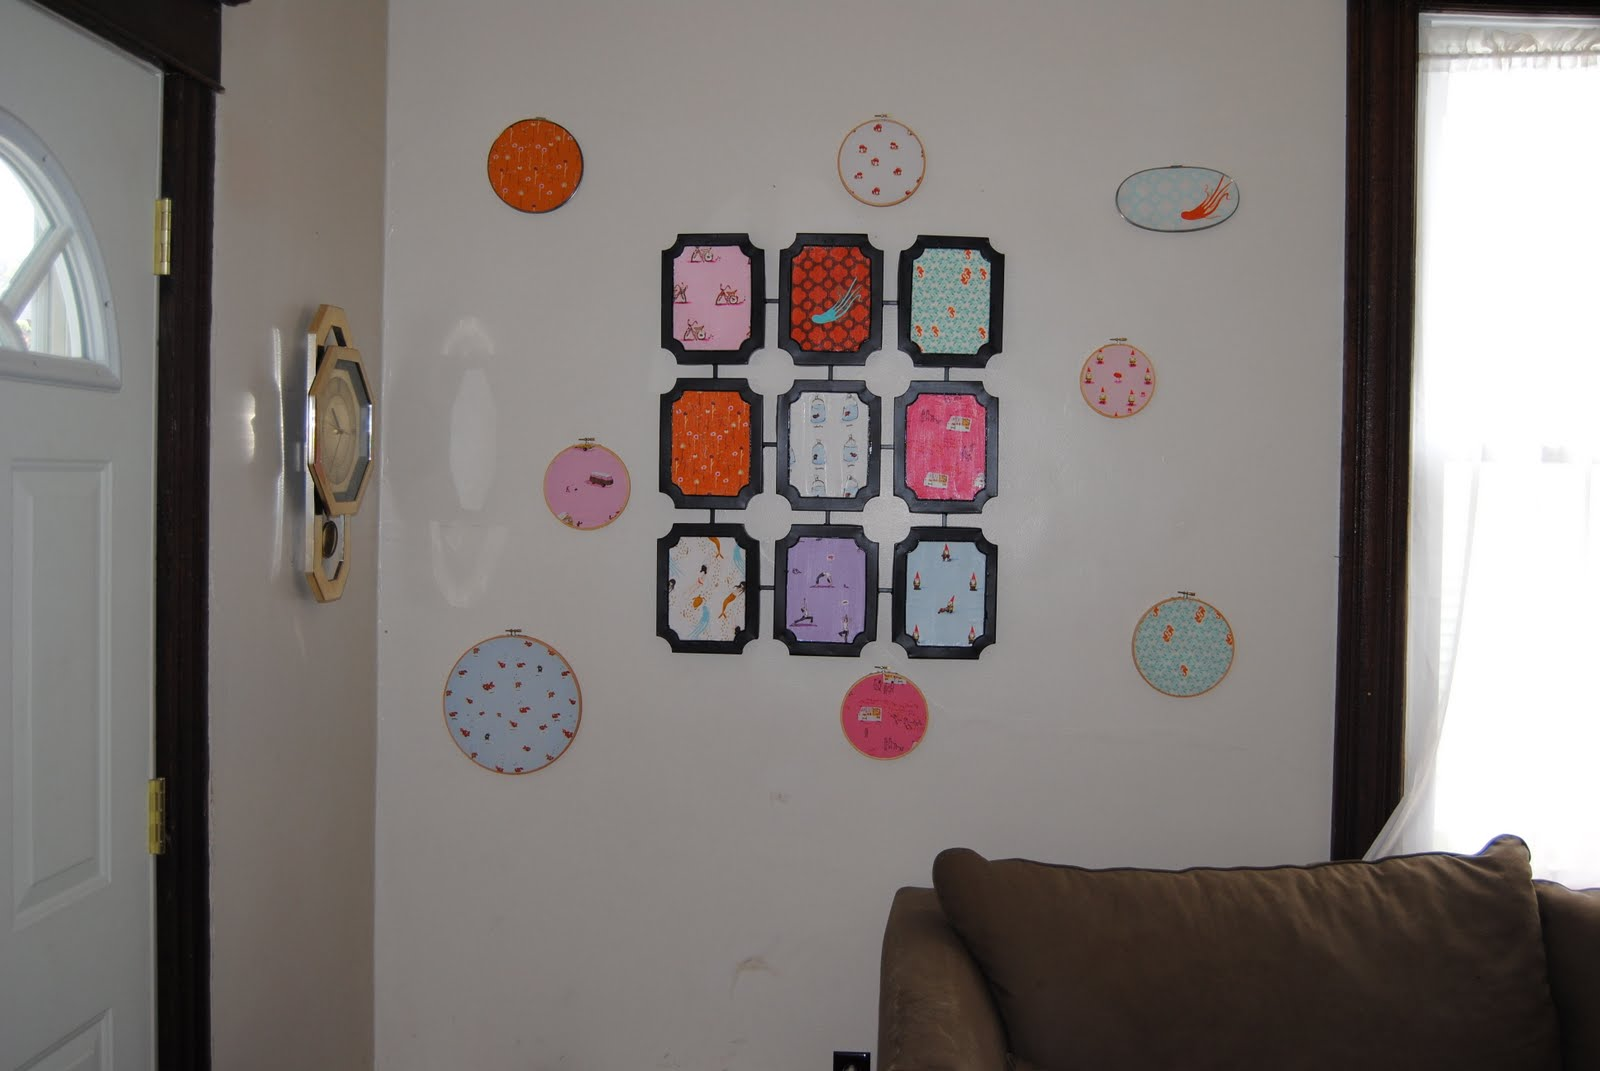 Wall Decor Ross : Realynn heather ross wall decor